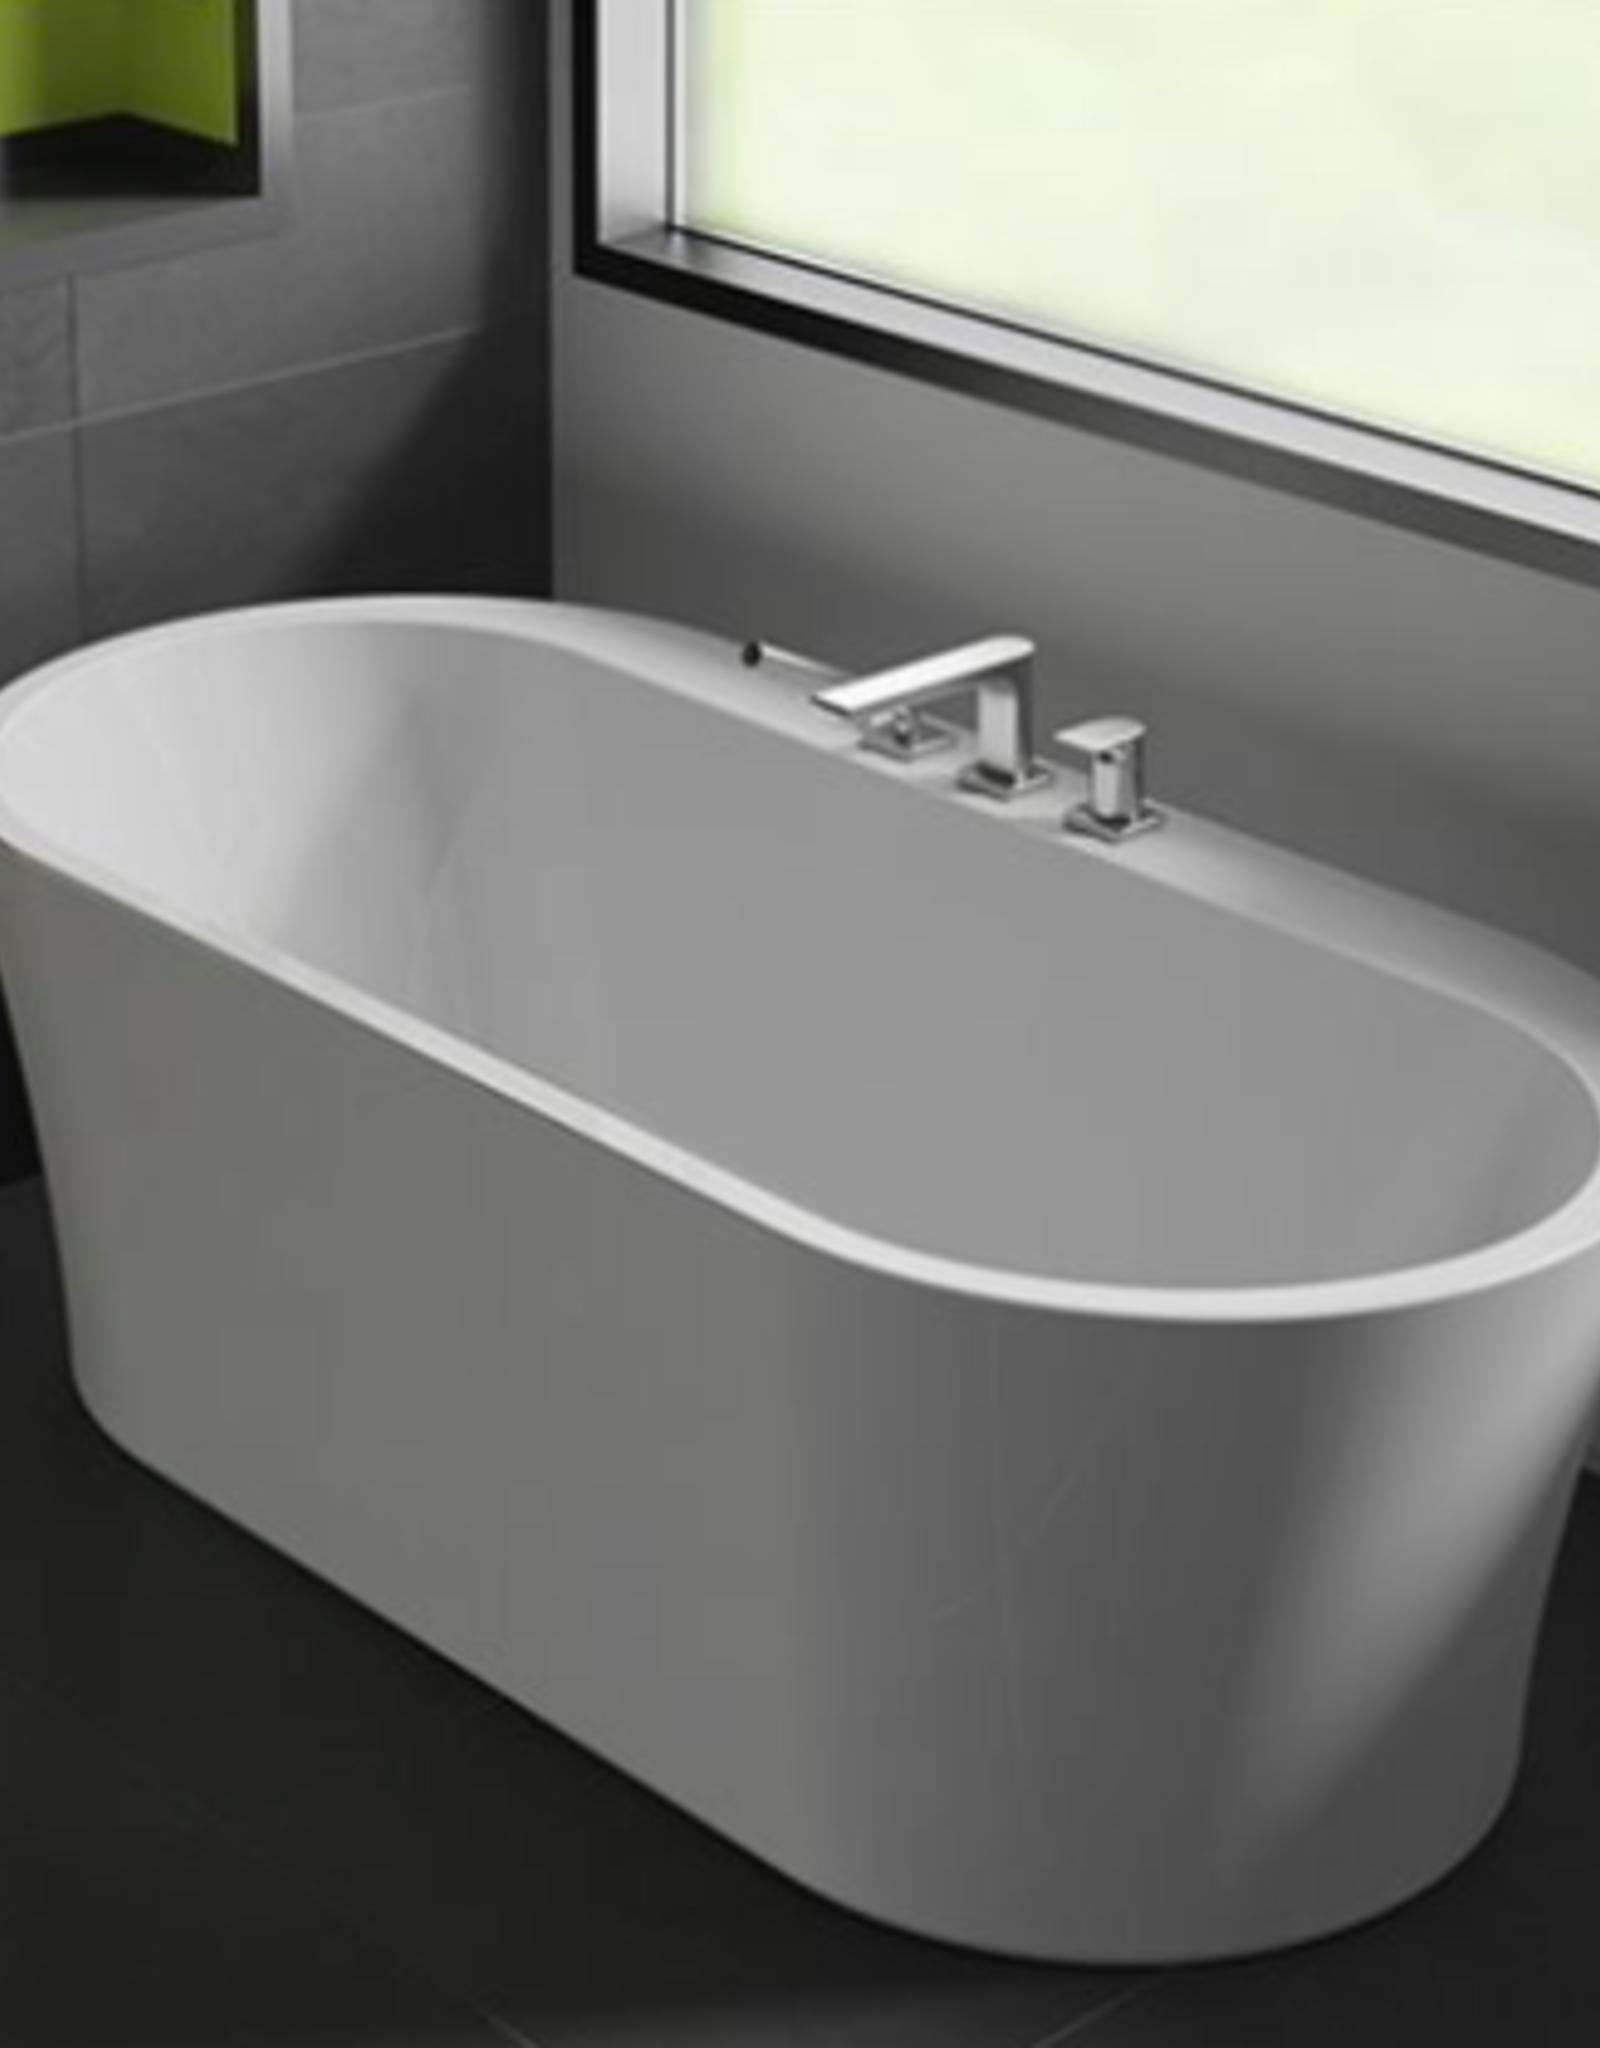 Fleurco Libretto Grande Freestanding Tub